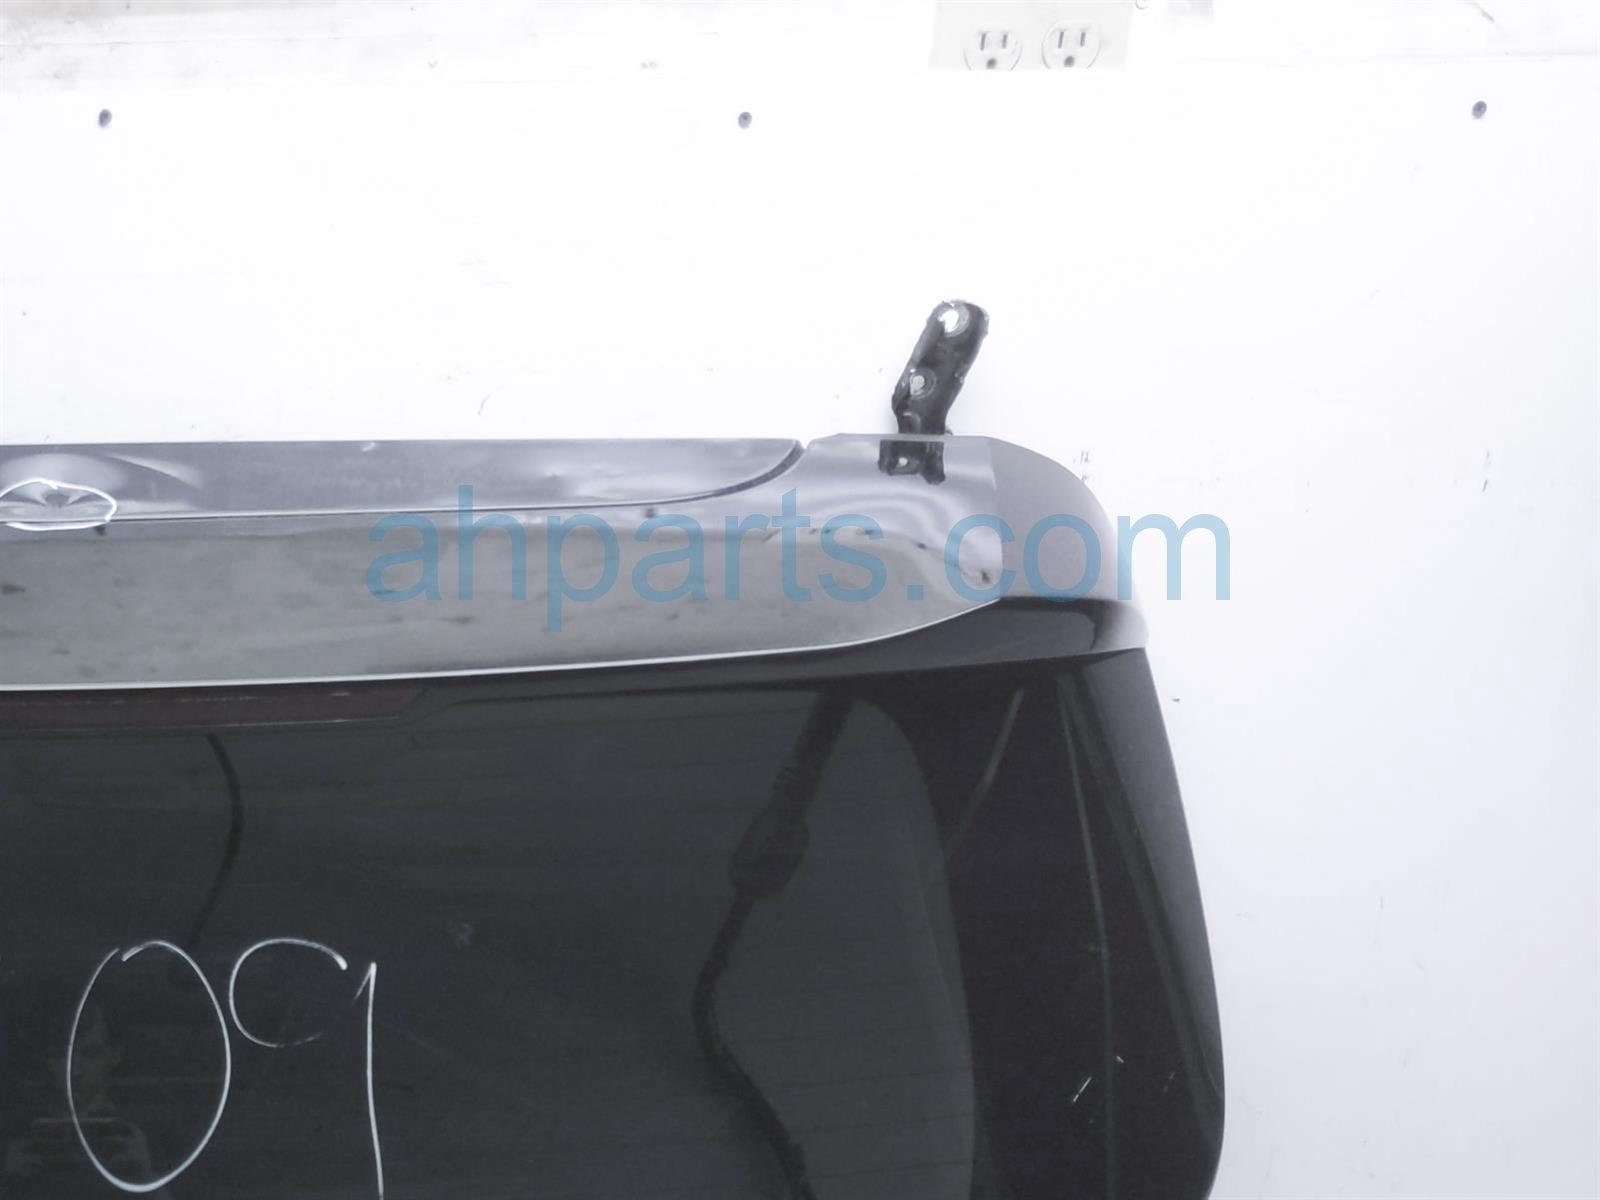 2019 Honda Pilot Deck Trunk Lid Lift Gate / Tail Gate   Black   68100 TG7 A10 Replacement